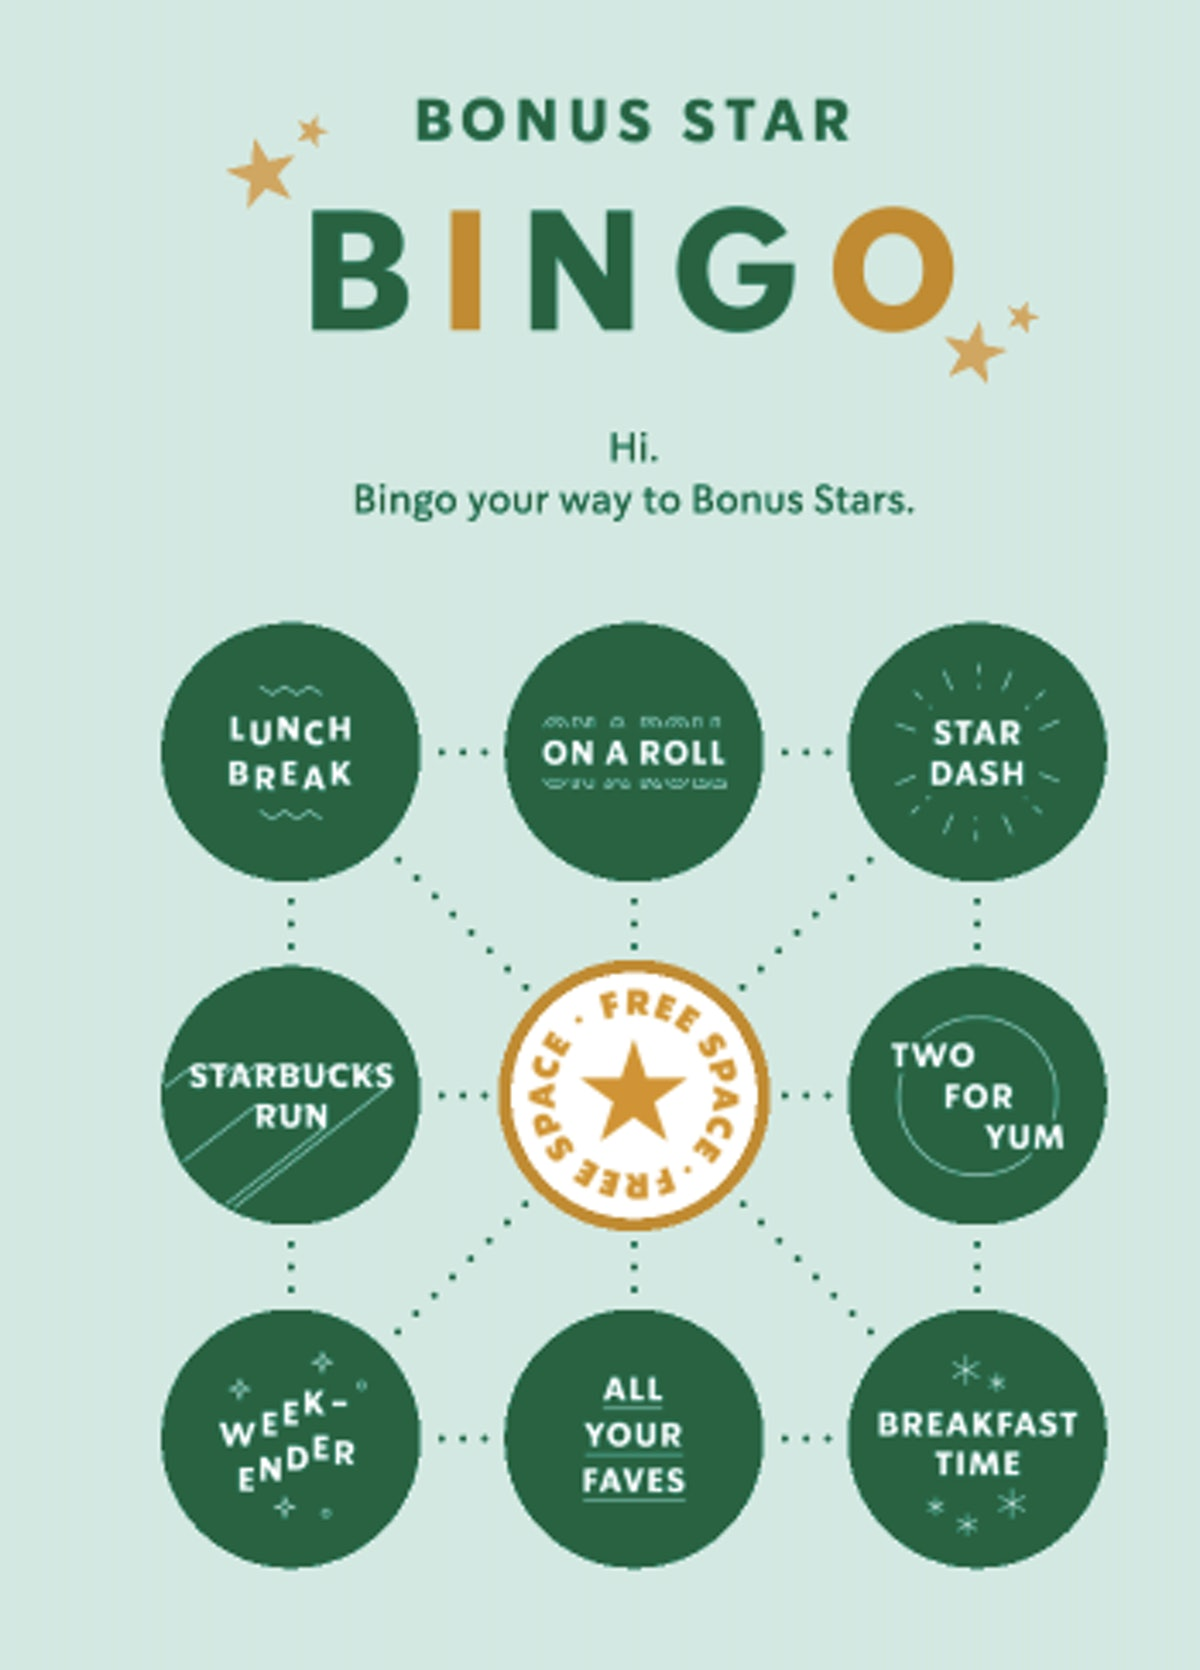 Starbucks' Bonus Star Bingo is back, and you can earn freebies on your coffee runs.